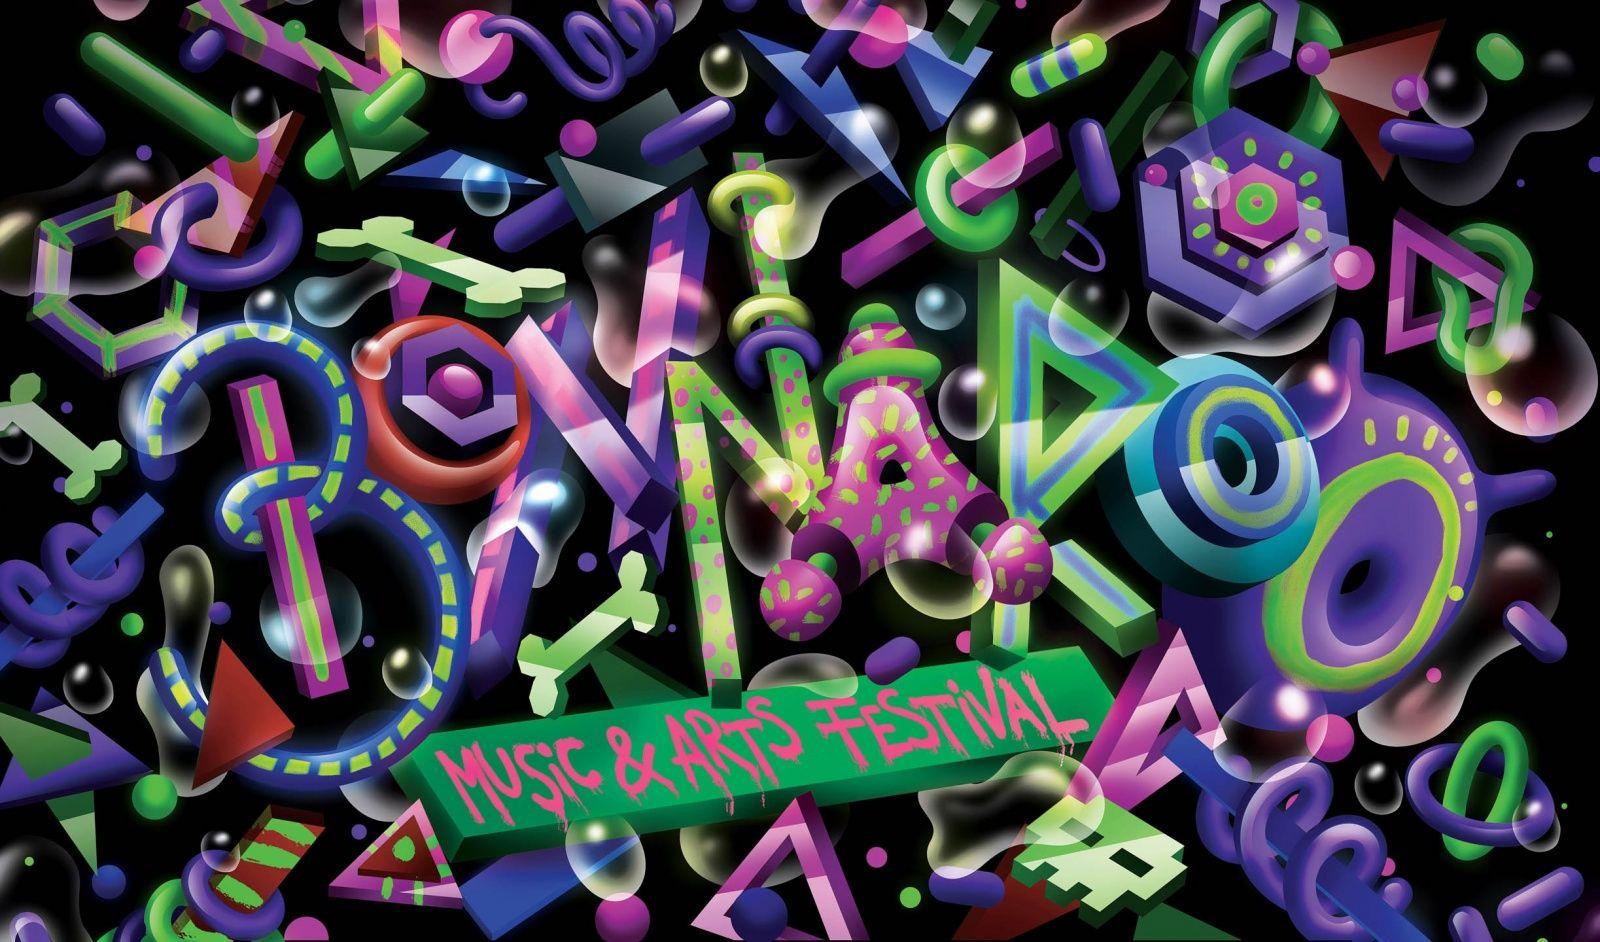 Alex trochut music with images art festival music